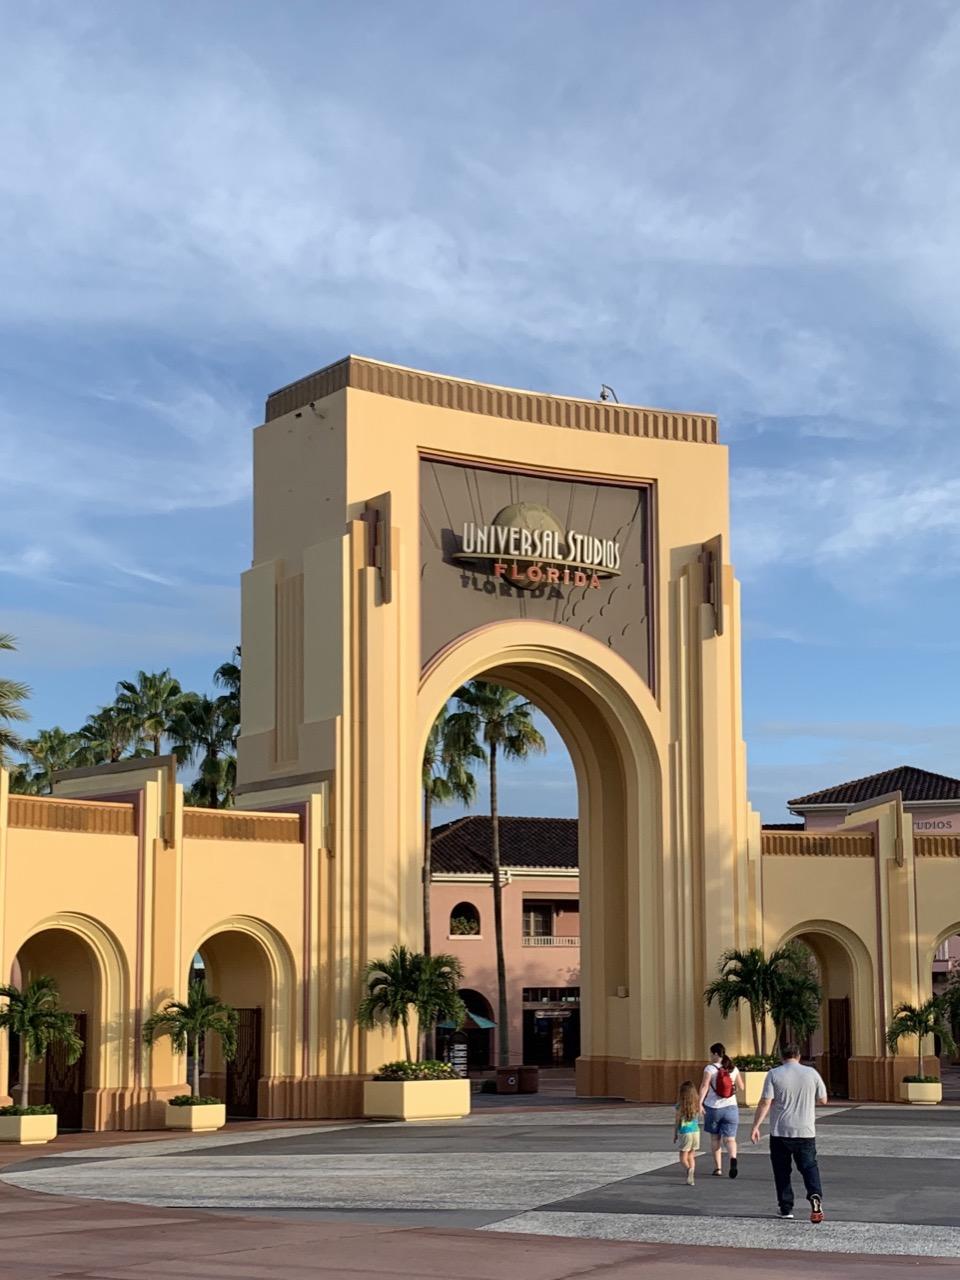 universal studios orlando trip vacation planinng guide 16 gate.jpeg